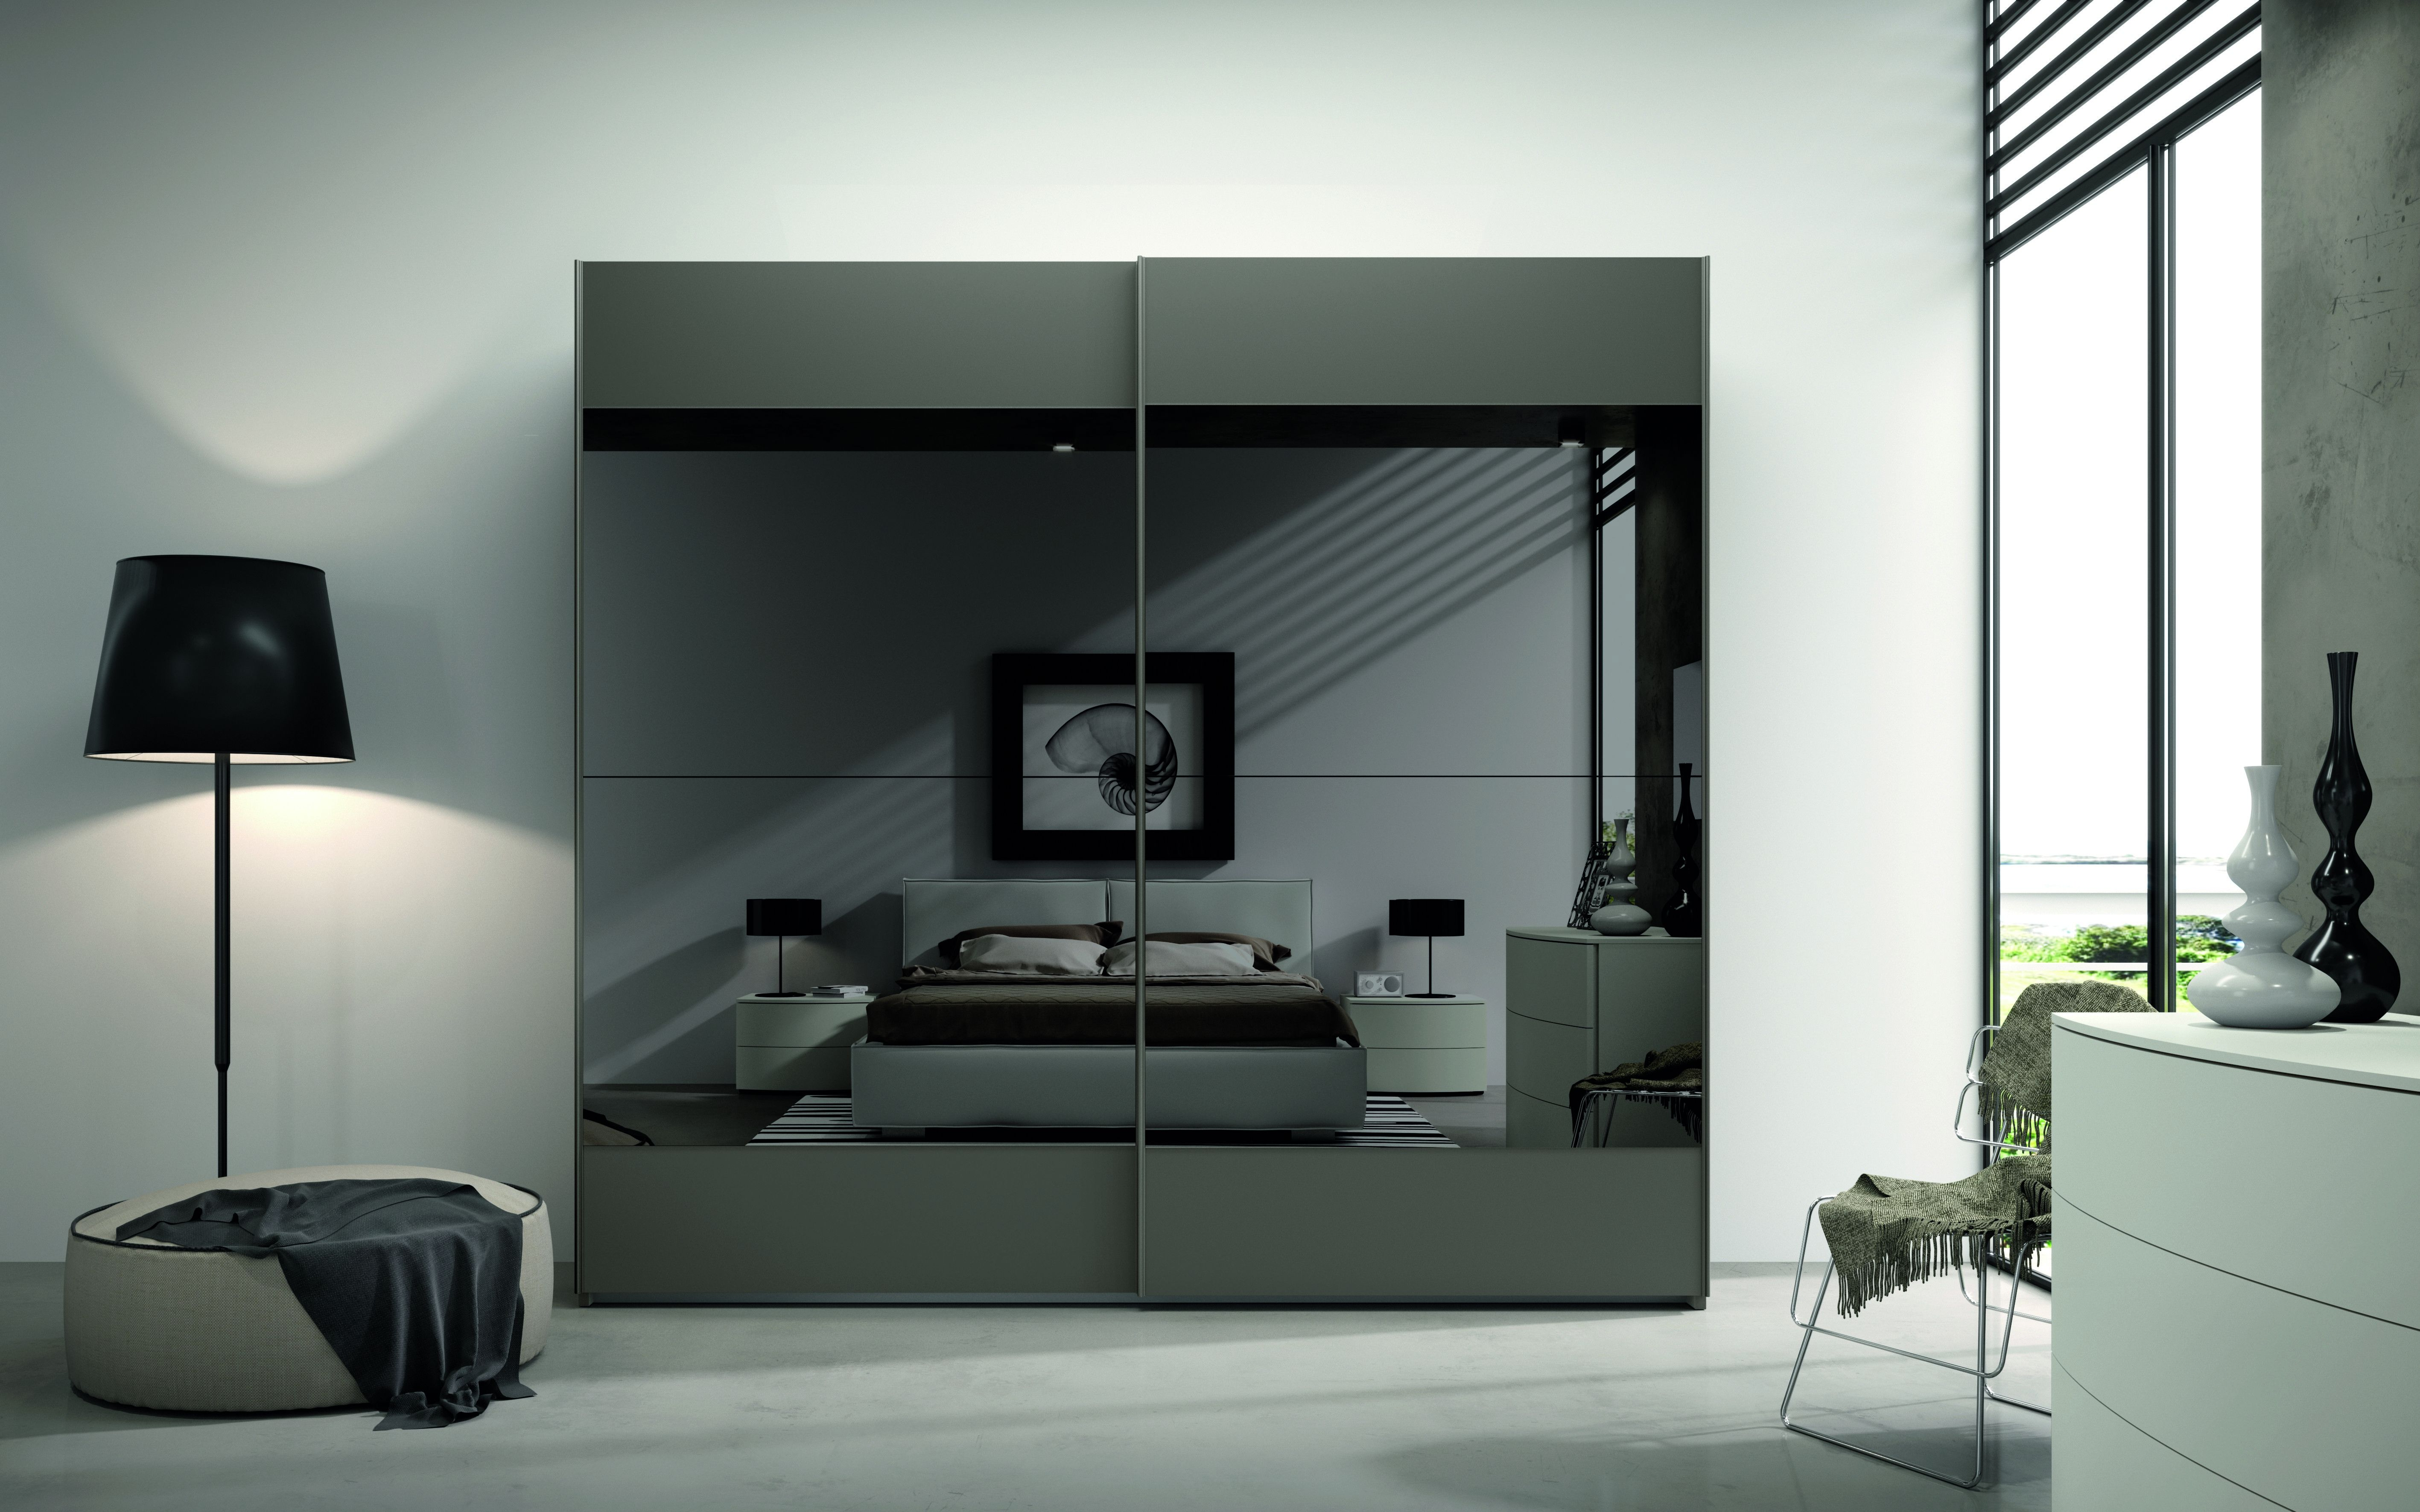 Vendita mobili online - armadio scorrevole 2 ante riquadri ...